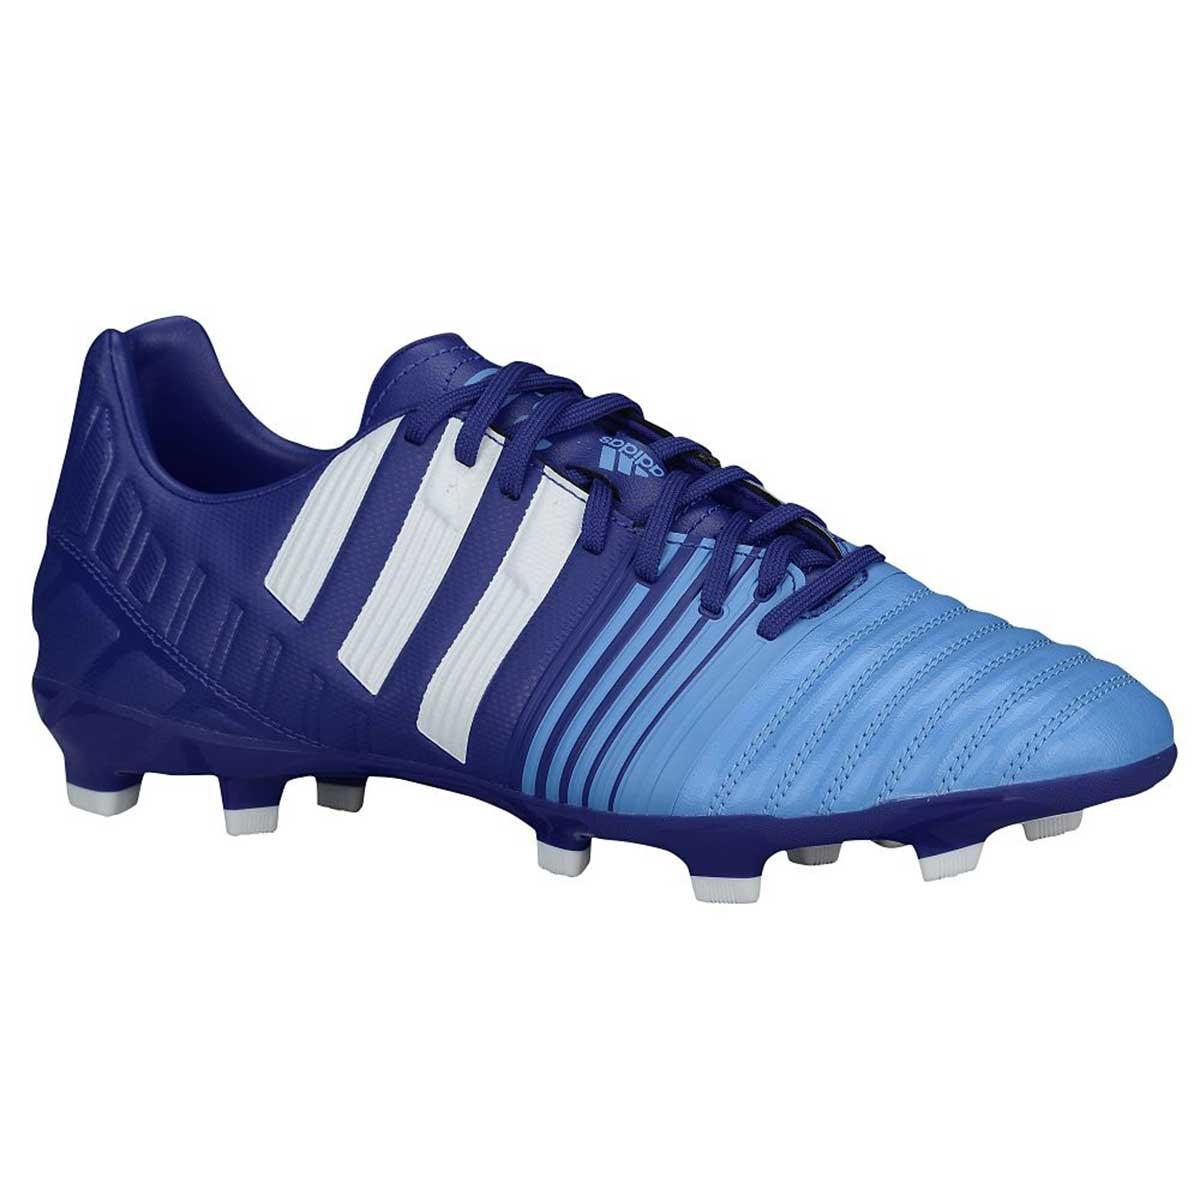 6eb93f89ffe Buy Adidas Nitrocharge 3.0 FG Football Shoes Online India